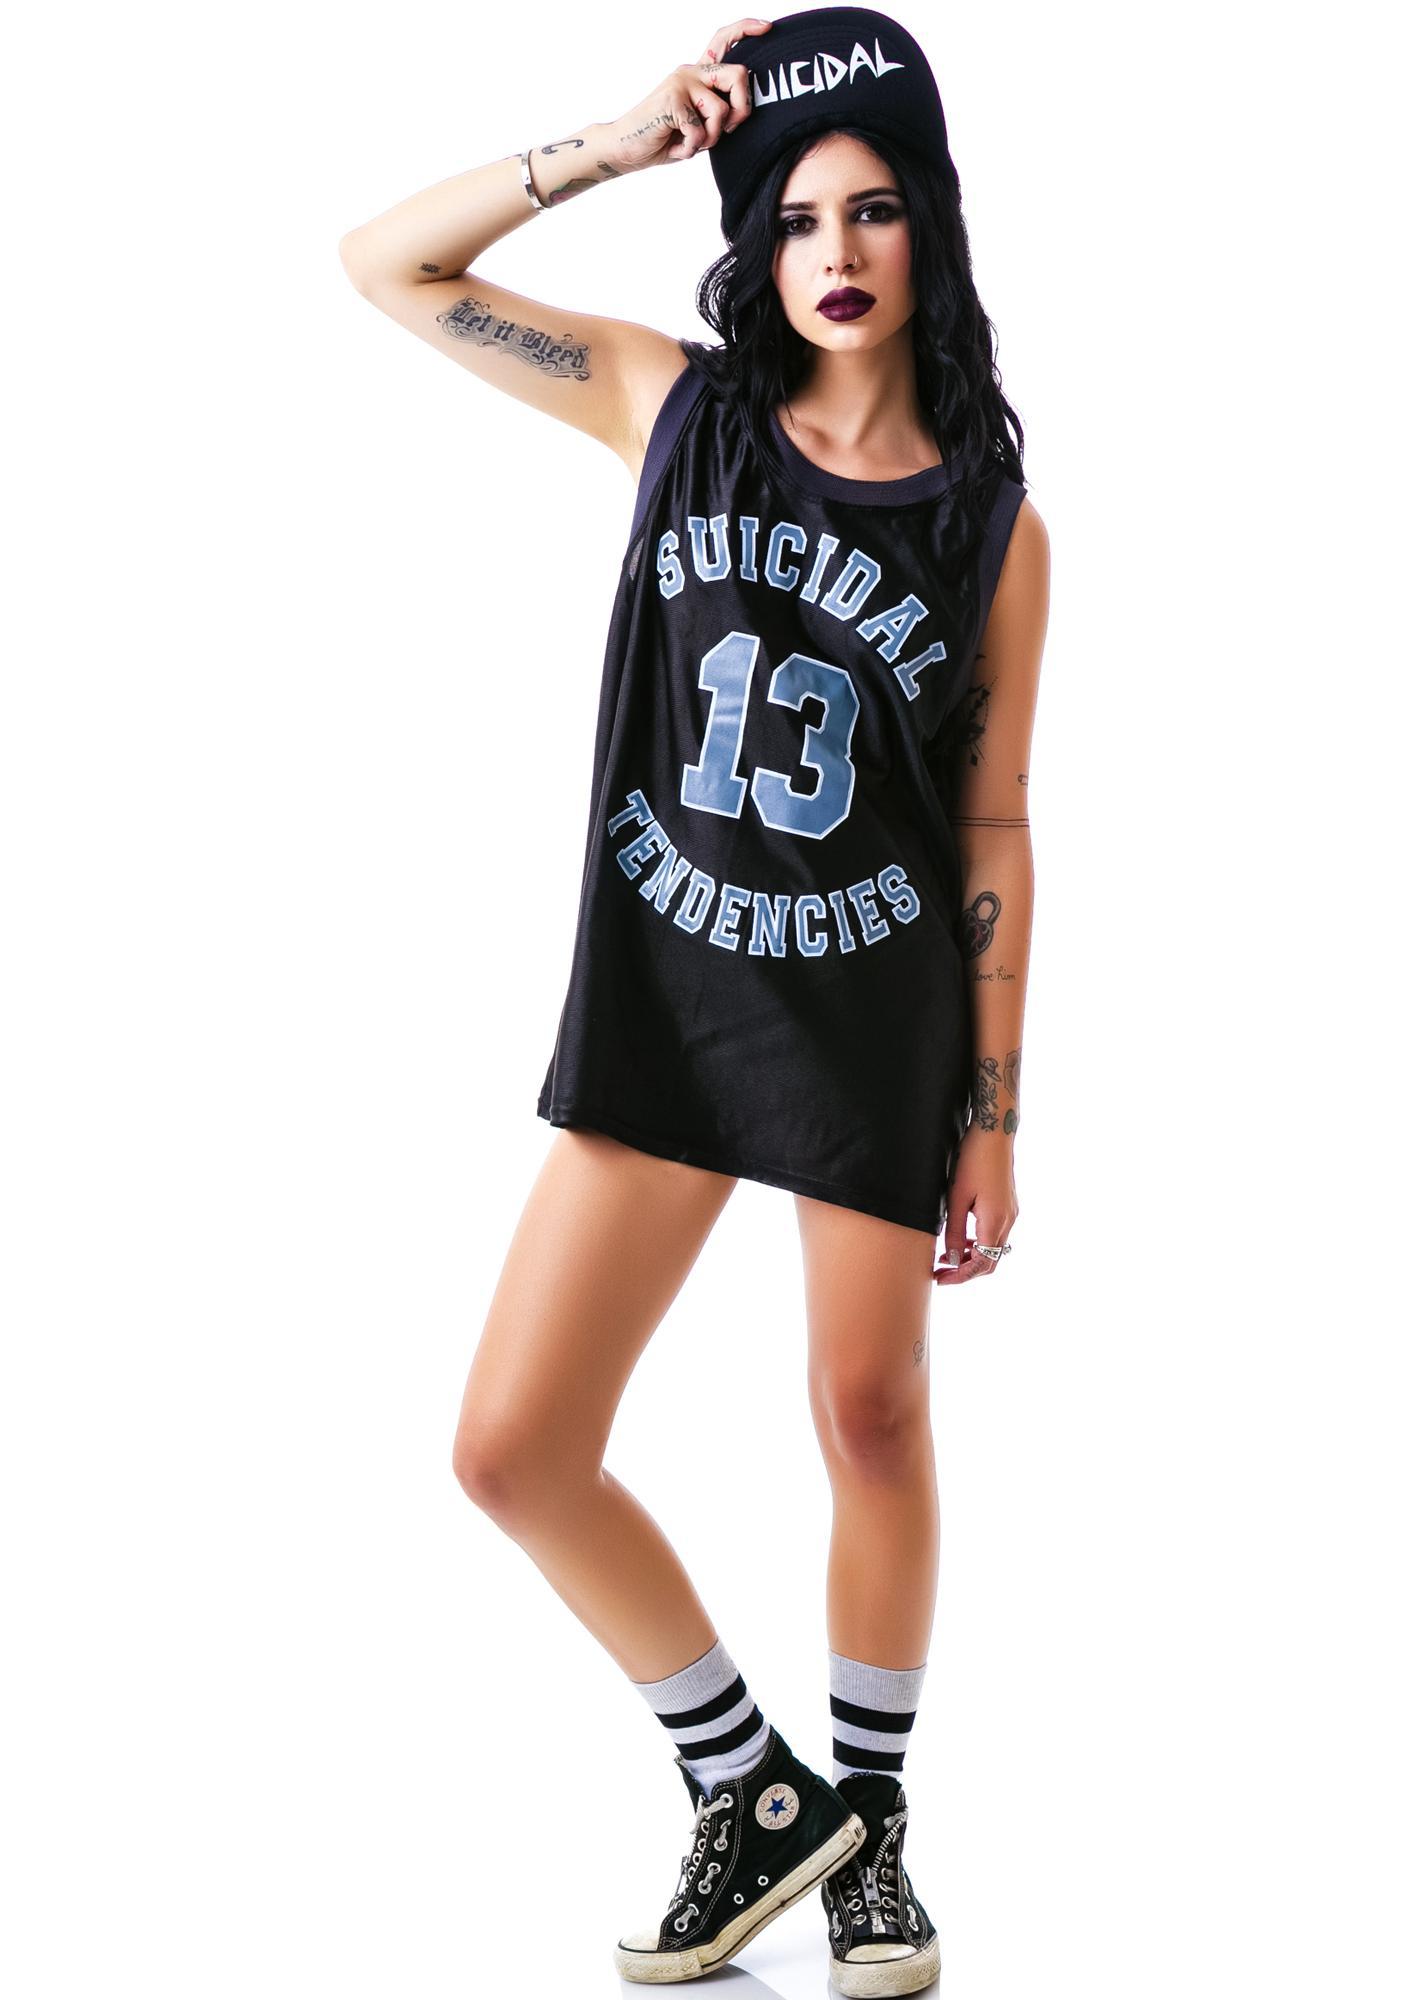 Suicidal Tendencies Basketball Jersey